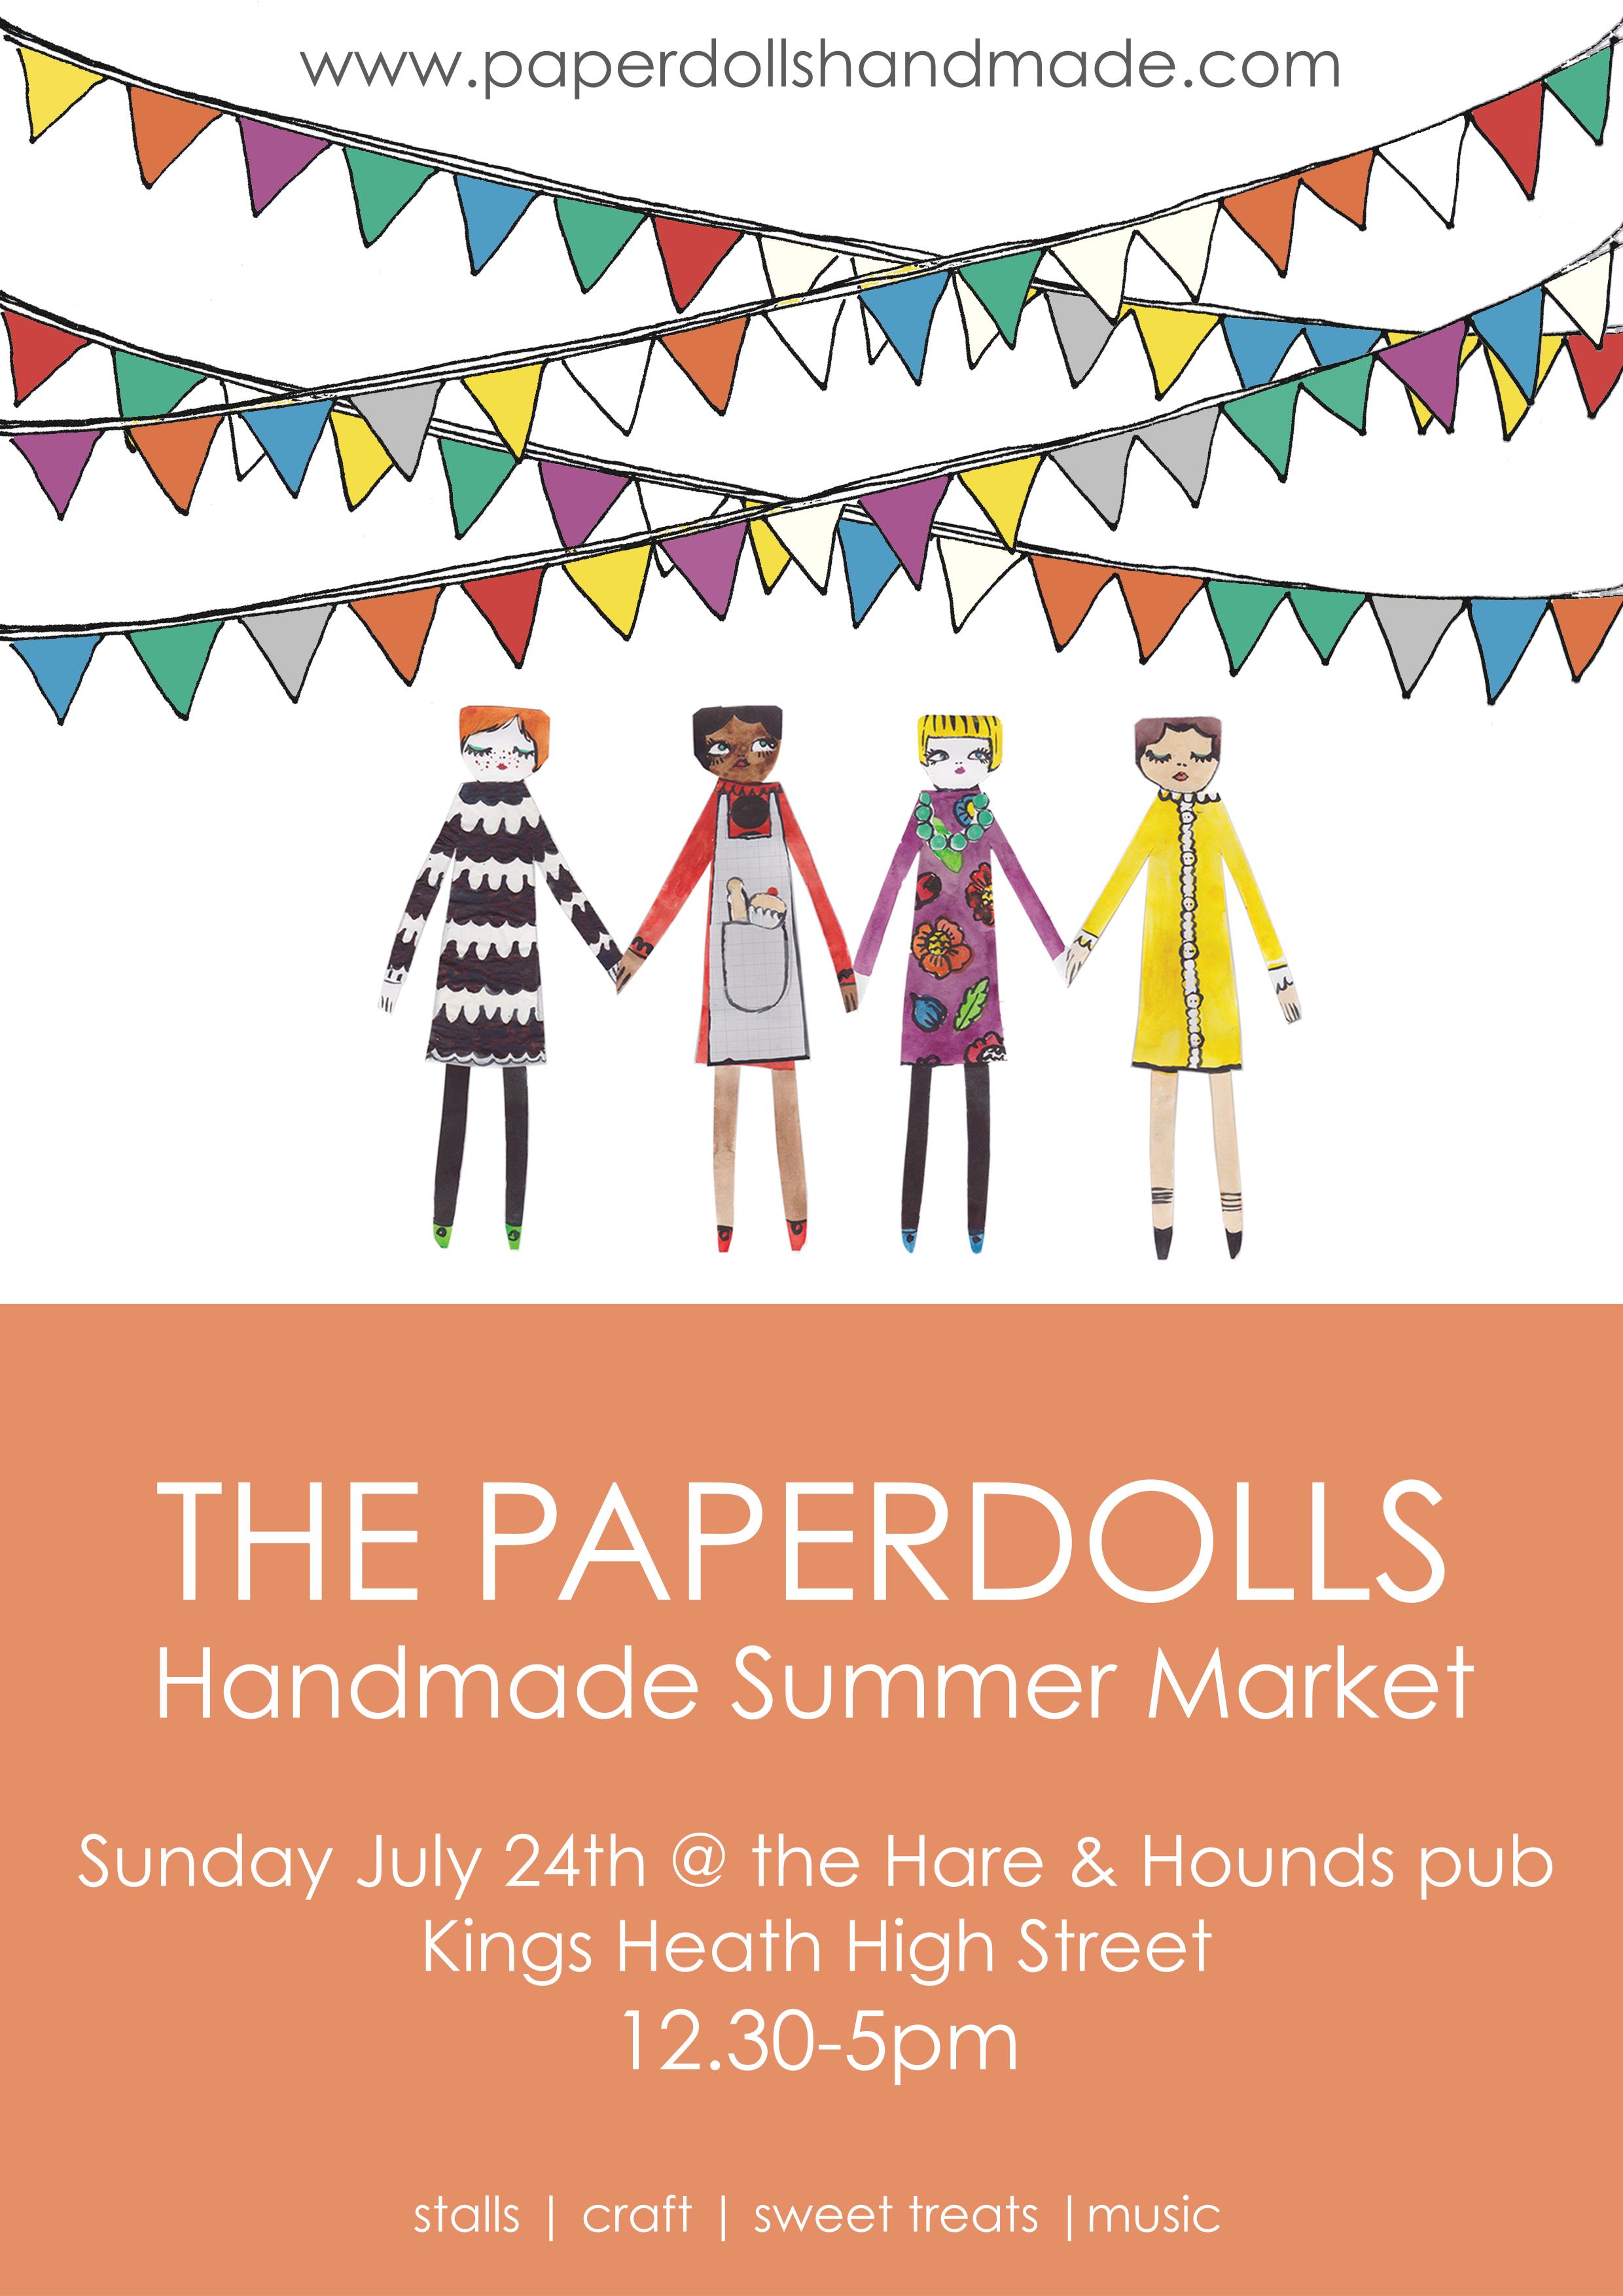 Paperdolls Handmade | Summer Market 2016